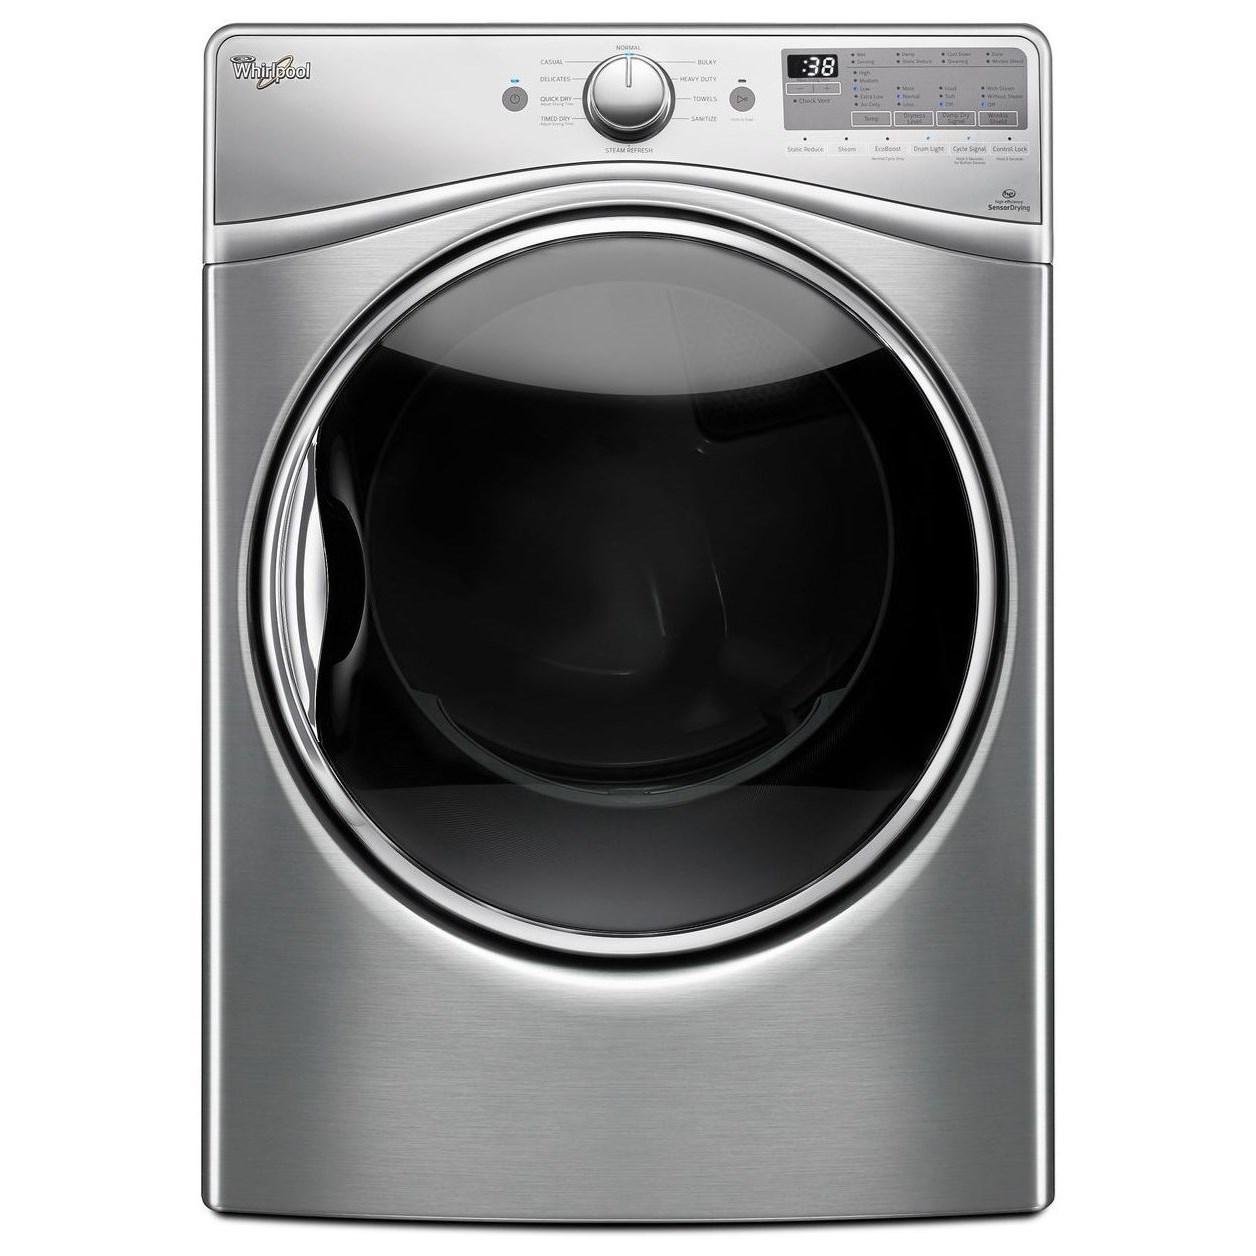 Whirlpool Gas Dryers 7.4 cu. ft. Gas Dryer - Item Number: WGD92HEFU